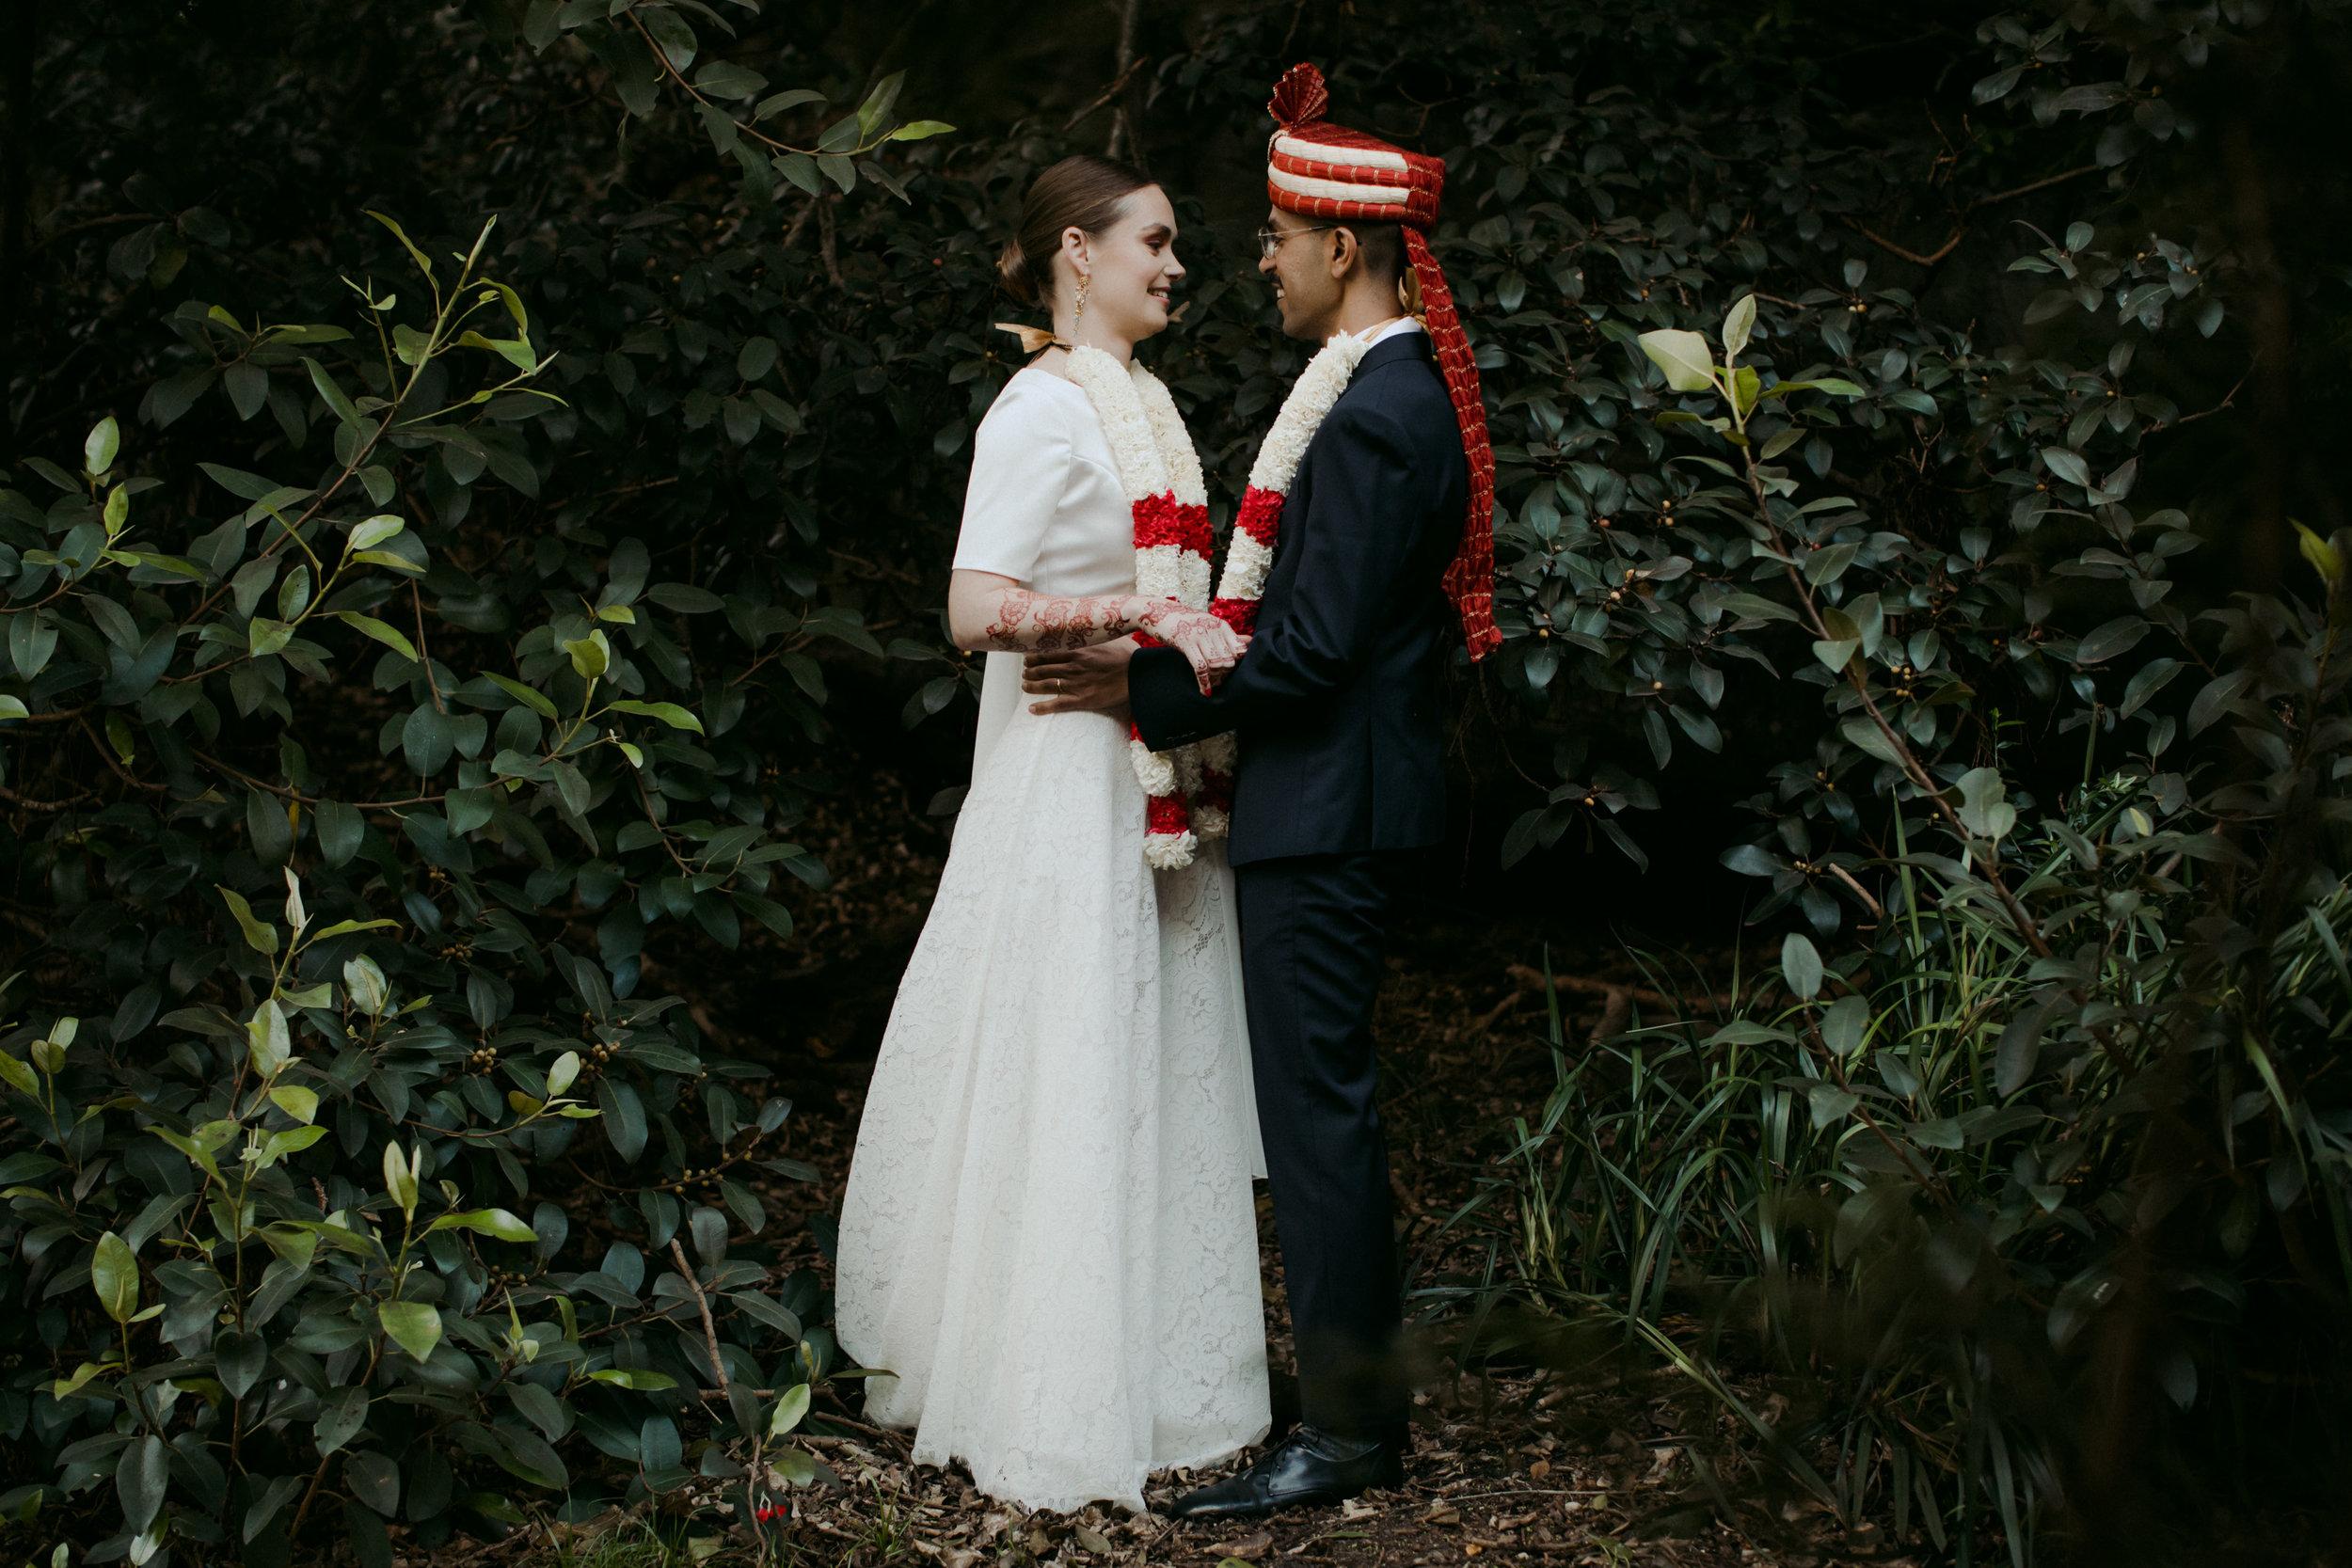 Amelia+Ani_Wedding_May2019_credit_OneDaySomewherePhotography-96.jpg